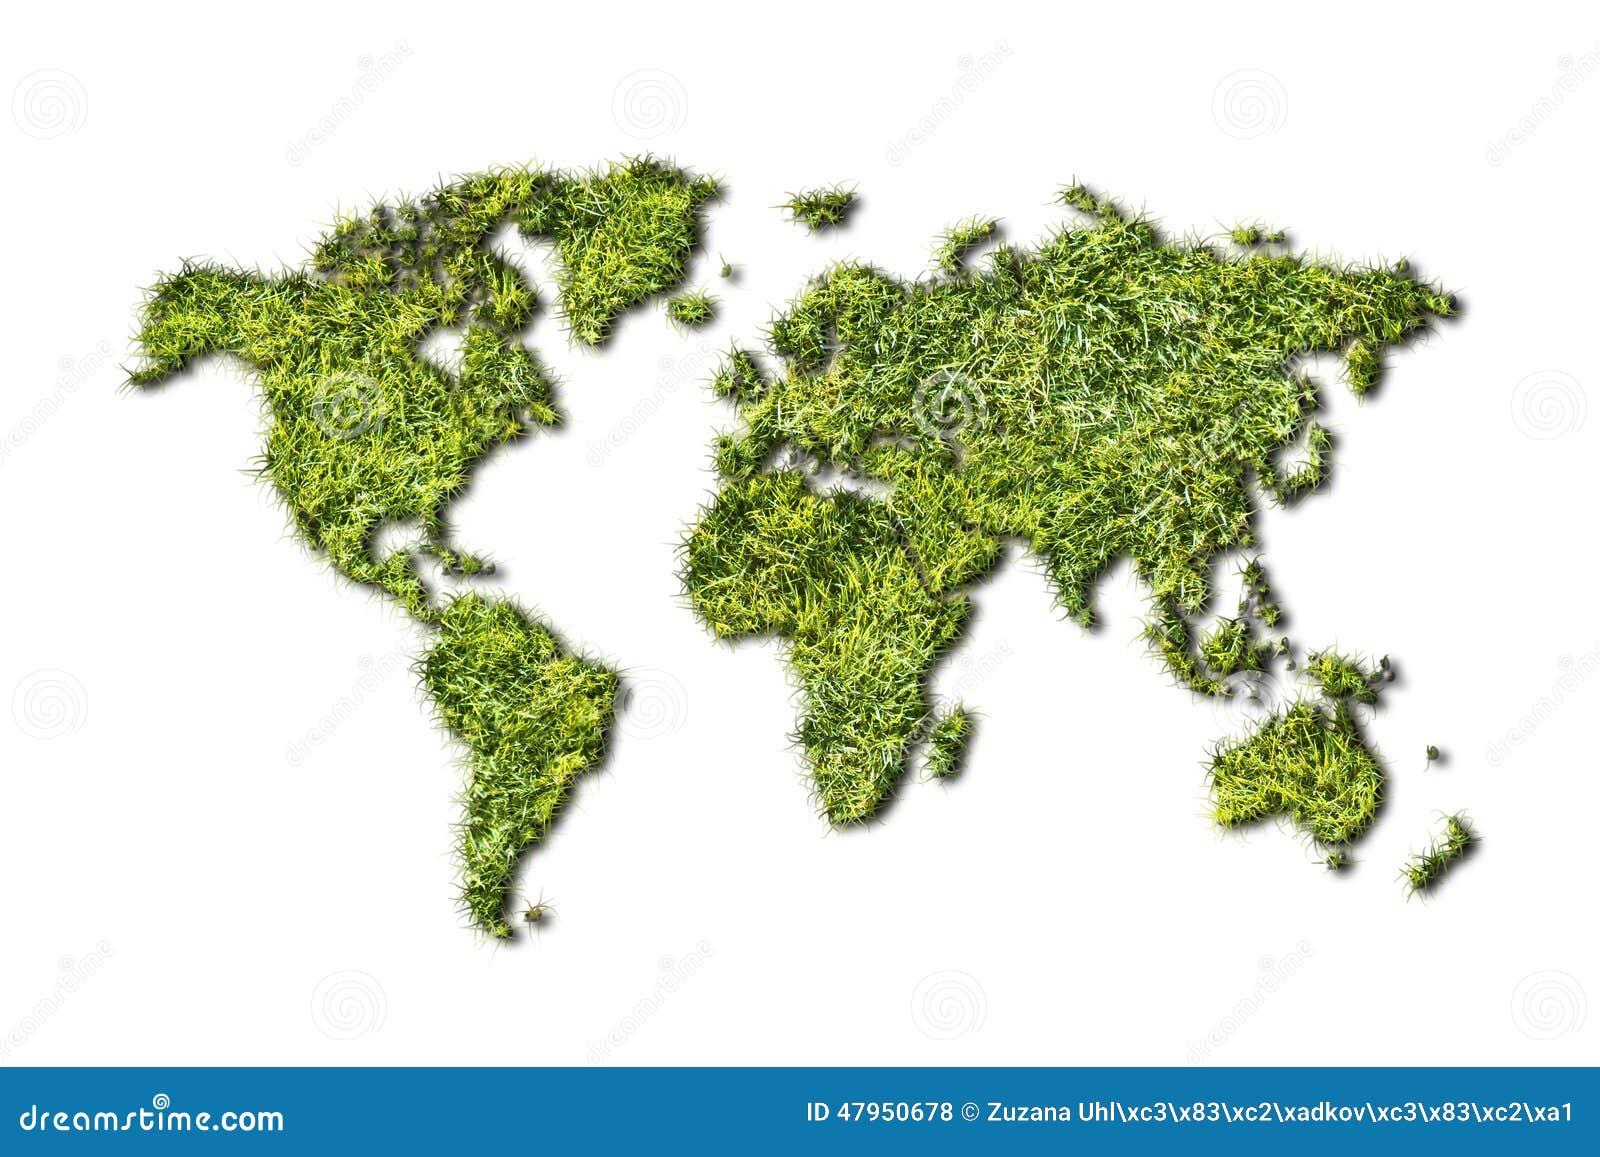 Mapa do mundo da ecologia da grama no fundo branco